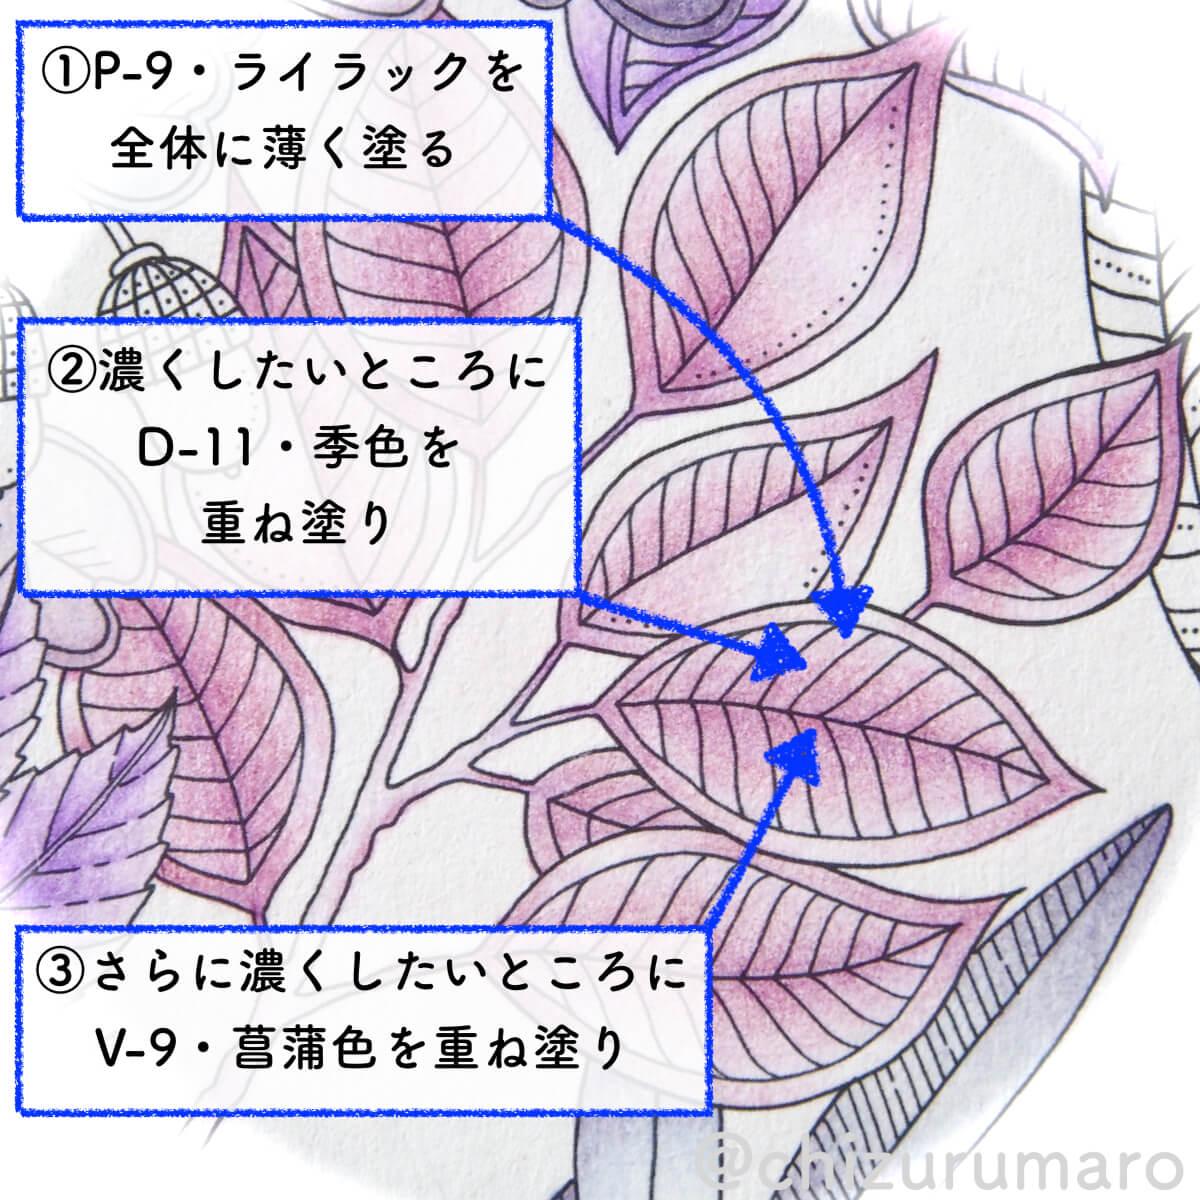 f:id:chizurumaro:20200513133604j:plain